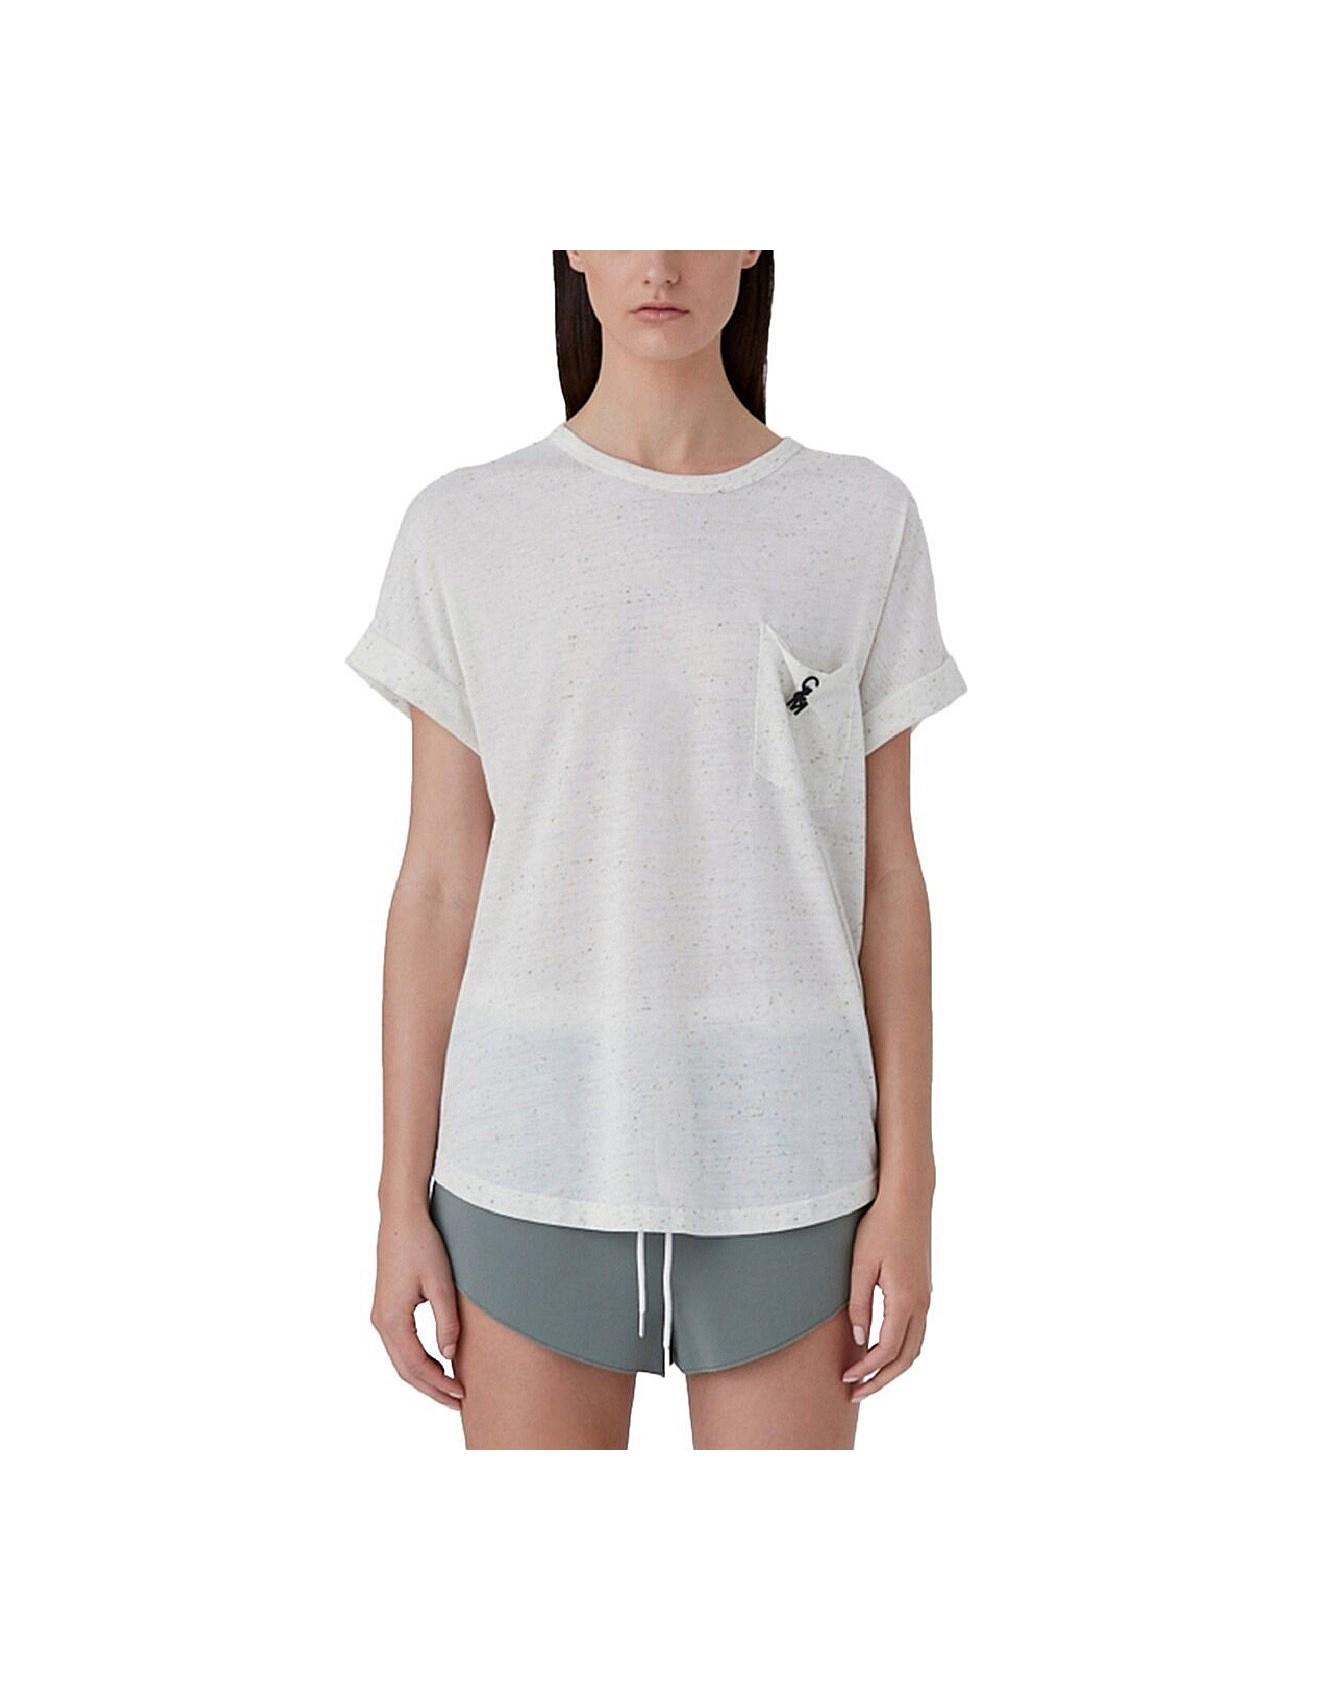 691f4419 Women's T-Shirts | Designer Tops & T-Shirts Online | David Jones ...